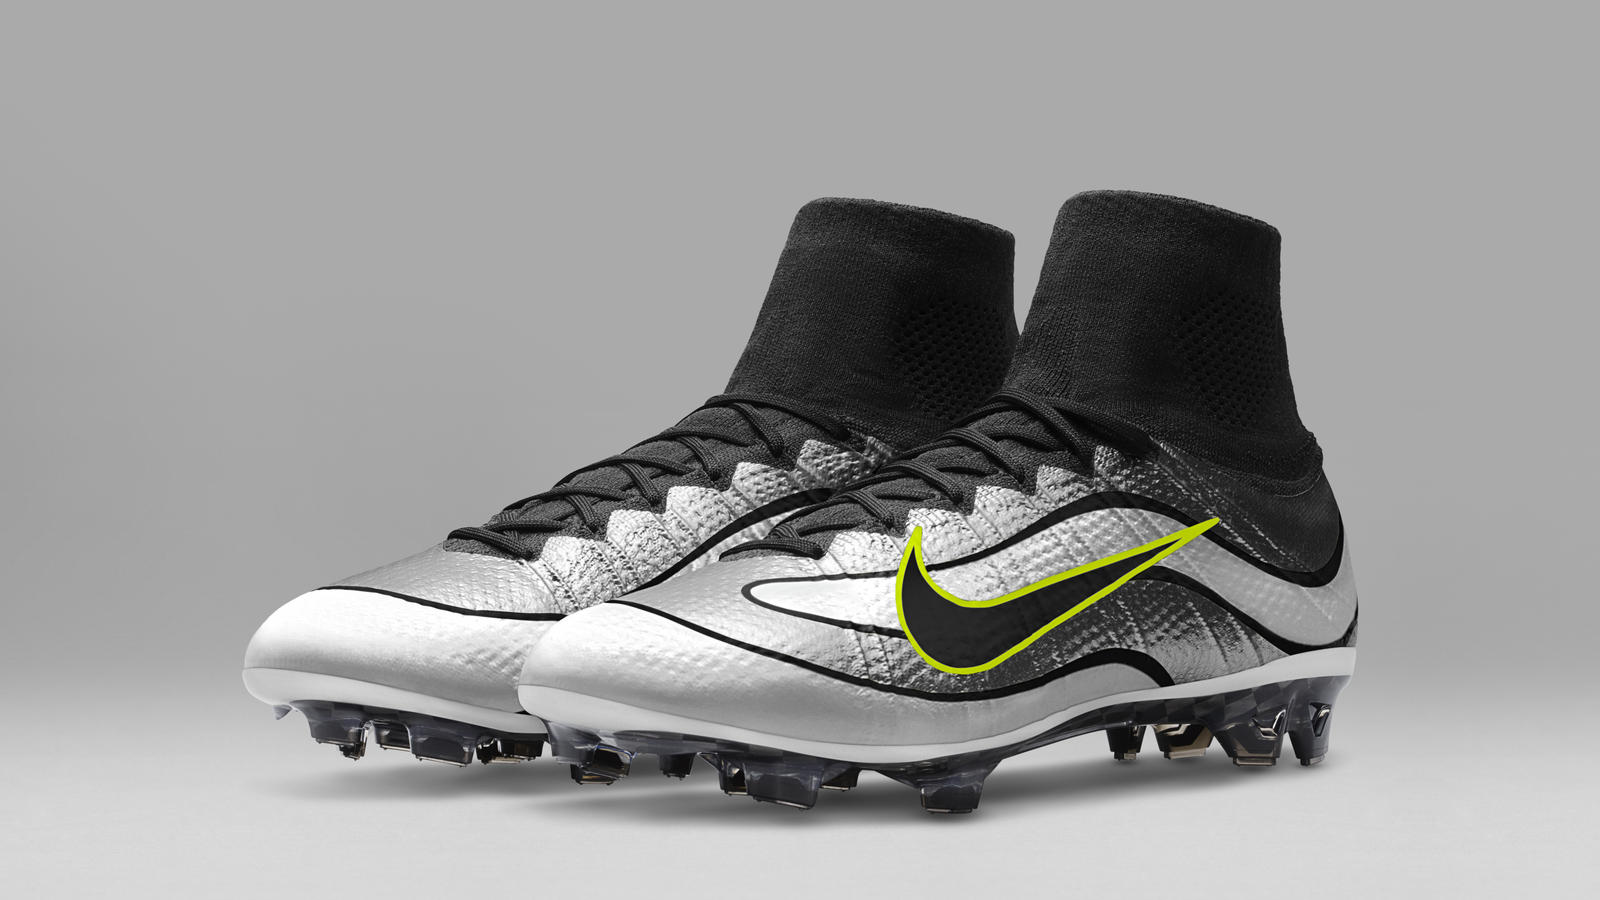 pretty nice b3f6d 3cd4b Nike Mercurial Superfly Heritage iD - Nike News